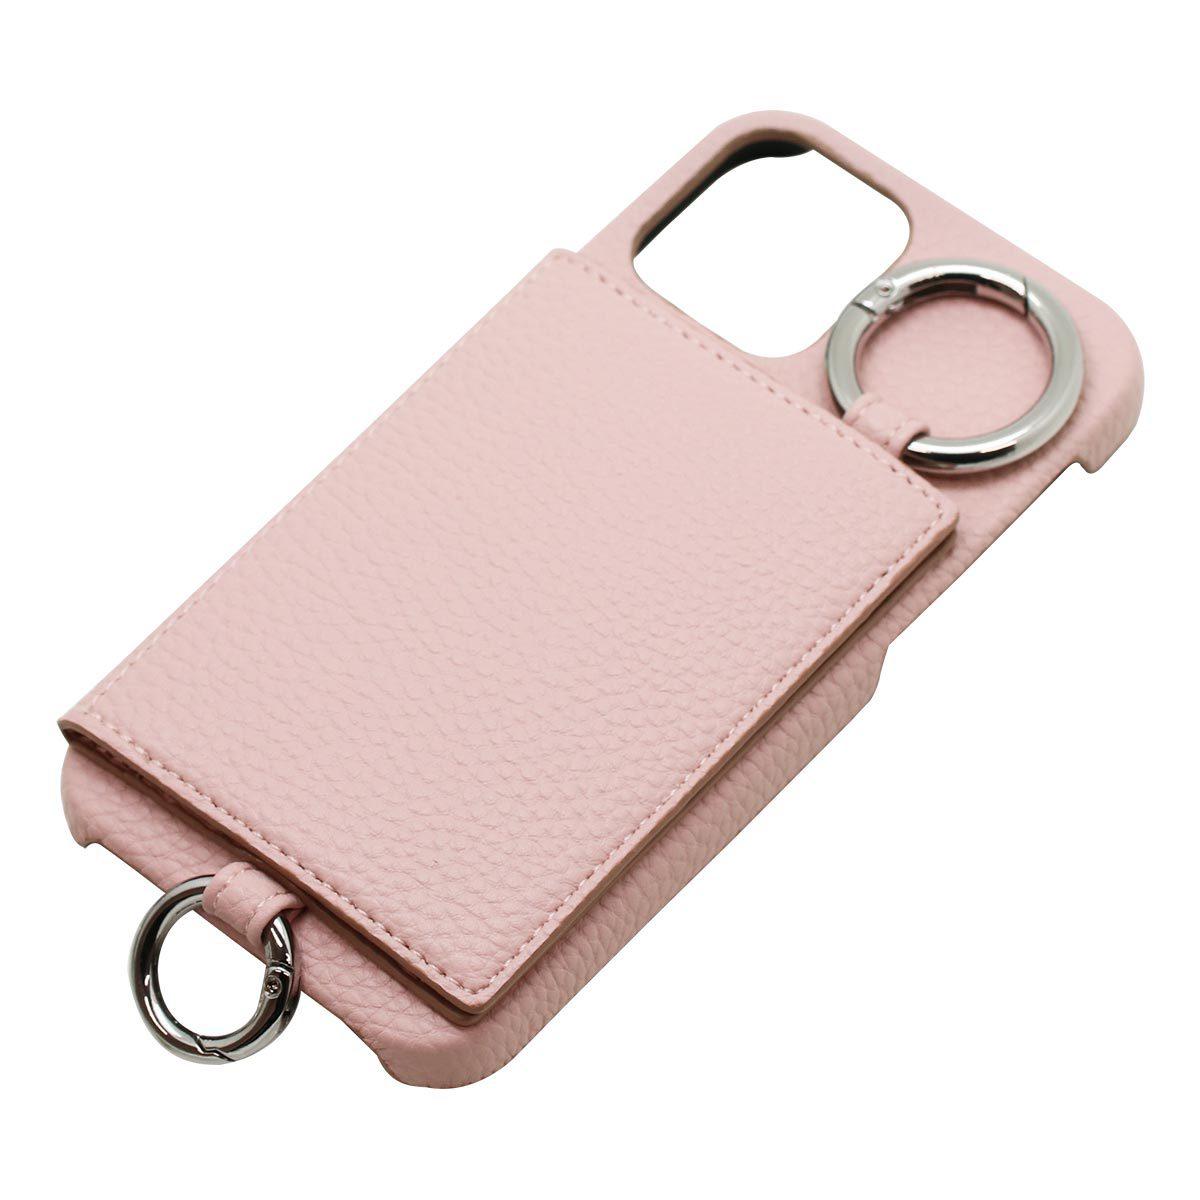 iPhone 12/12Pro用カードポケット付きショルダーケース